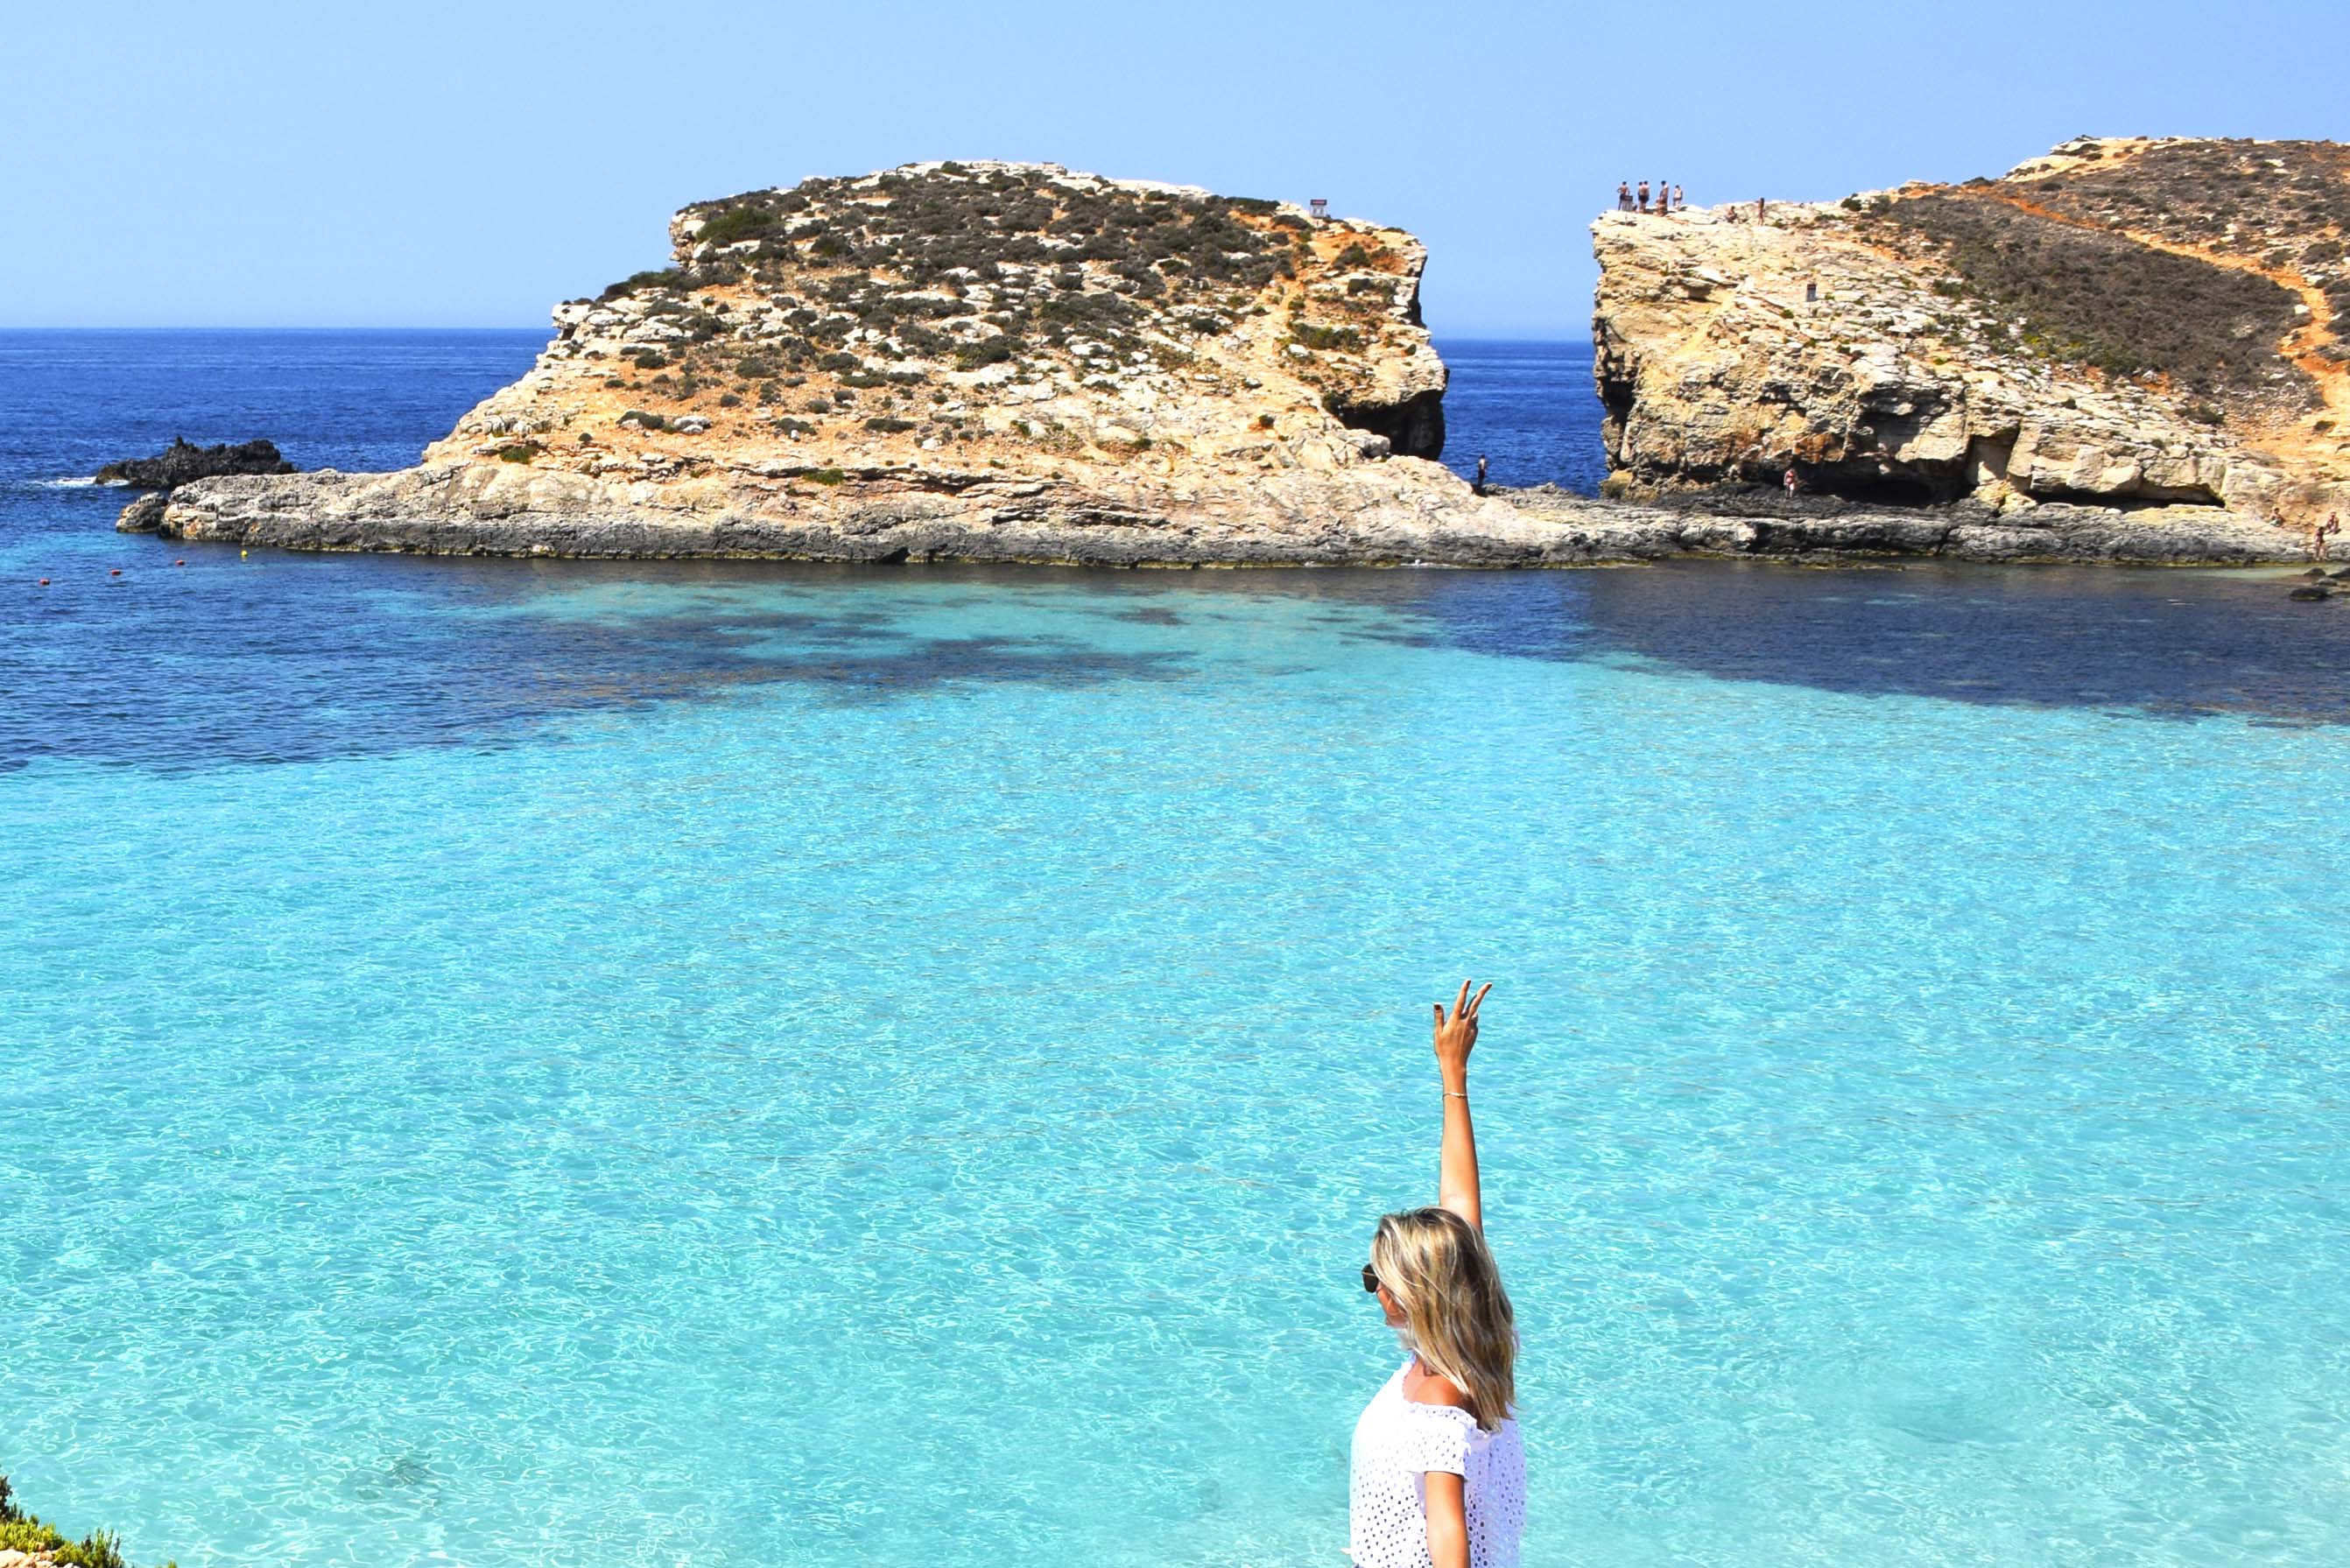 Blue Lagoon na Ilha de Comino, em Malta | foto: Lala Rebelo